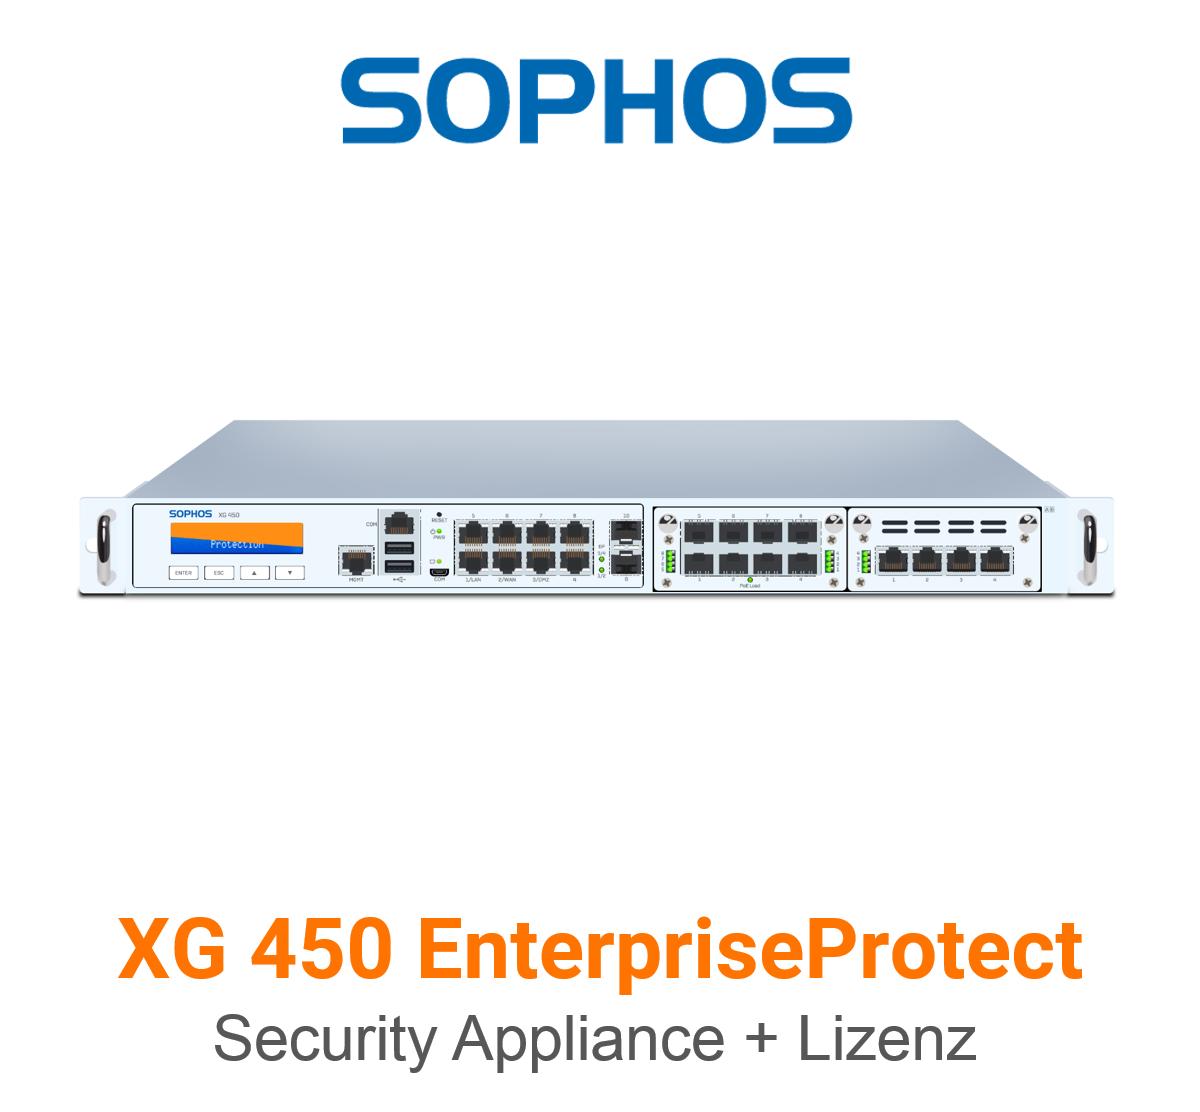 Sophos XG 450 EnterpriseProtect Bundle (Hardware + Lizenz)